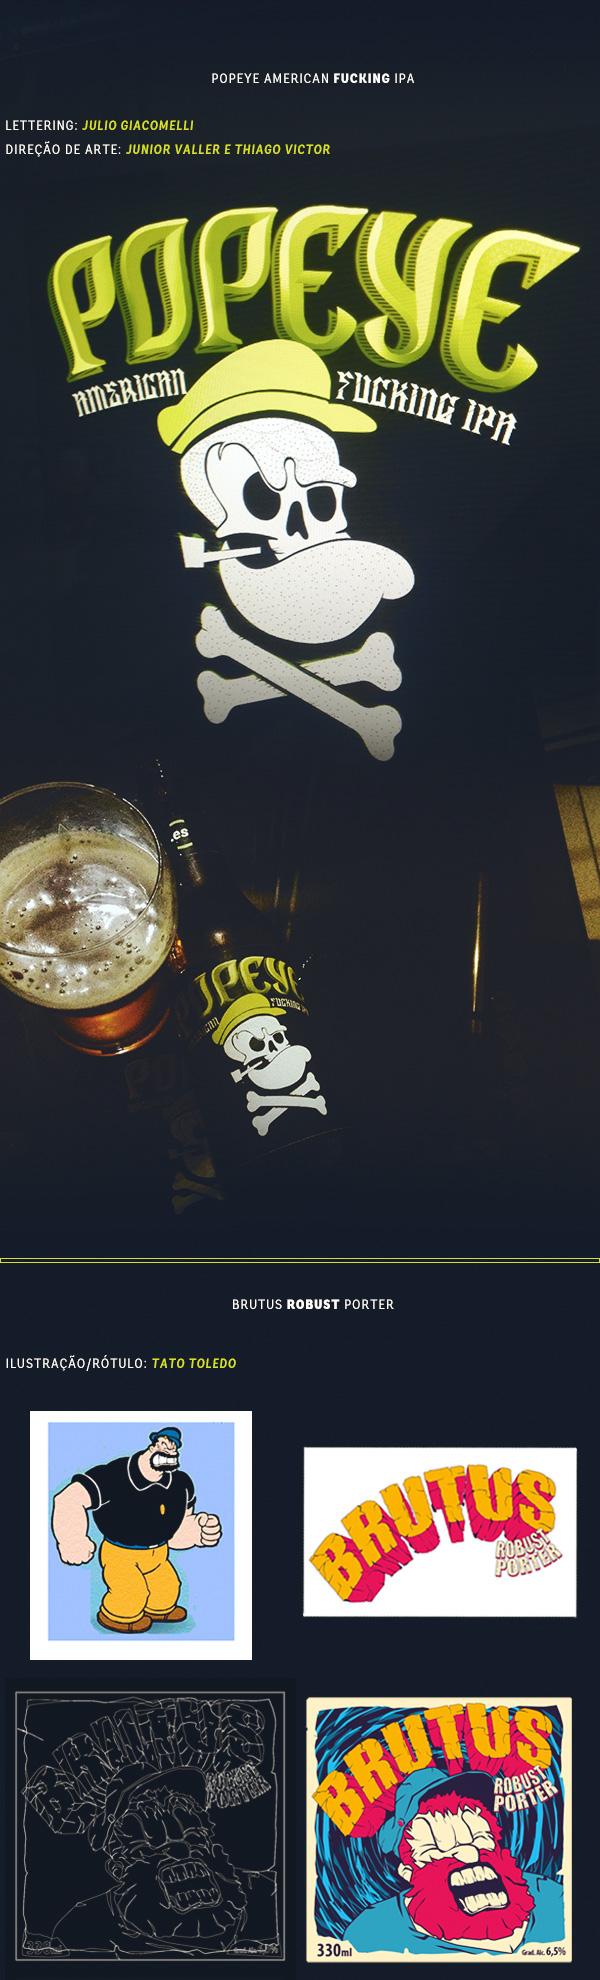 Cervejas da Espinafre by Thiago Victor, via Behance